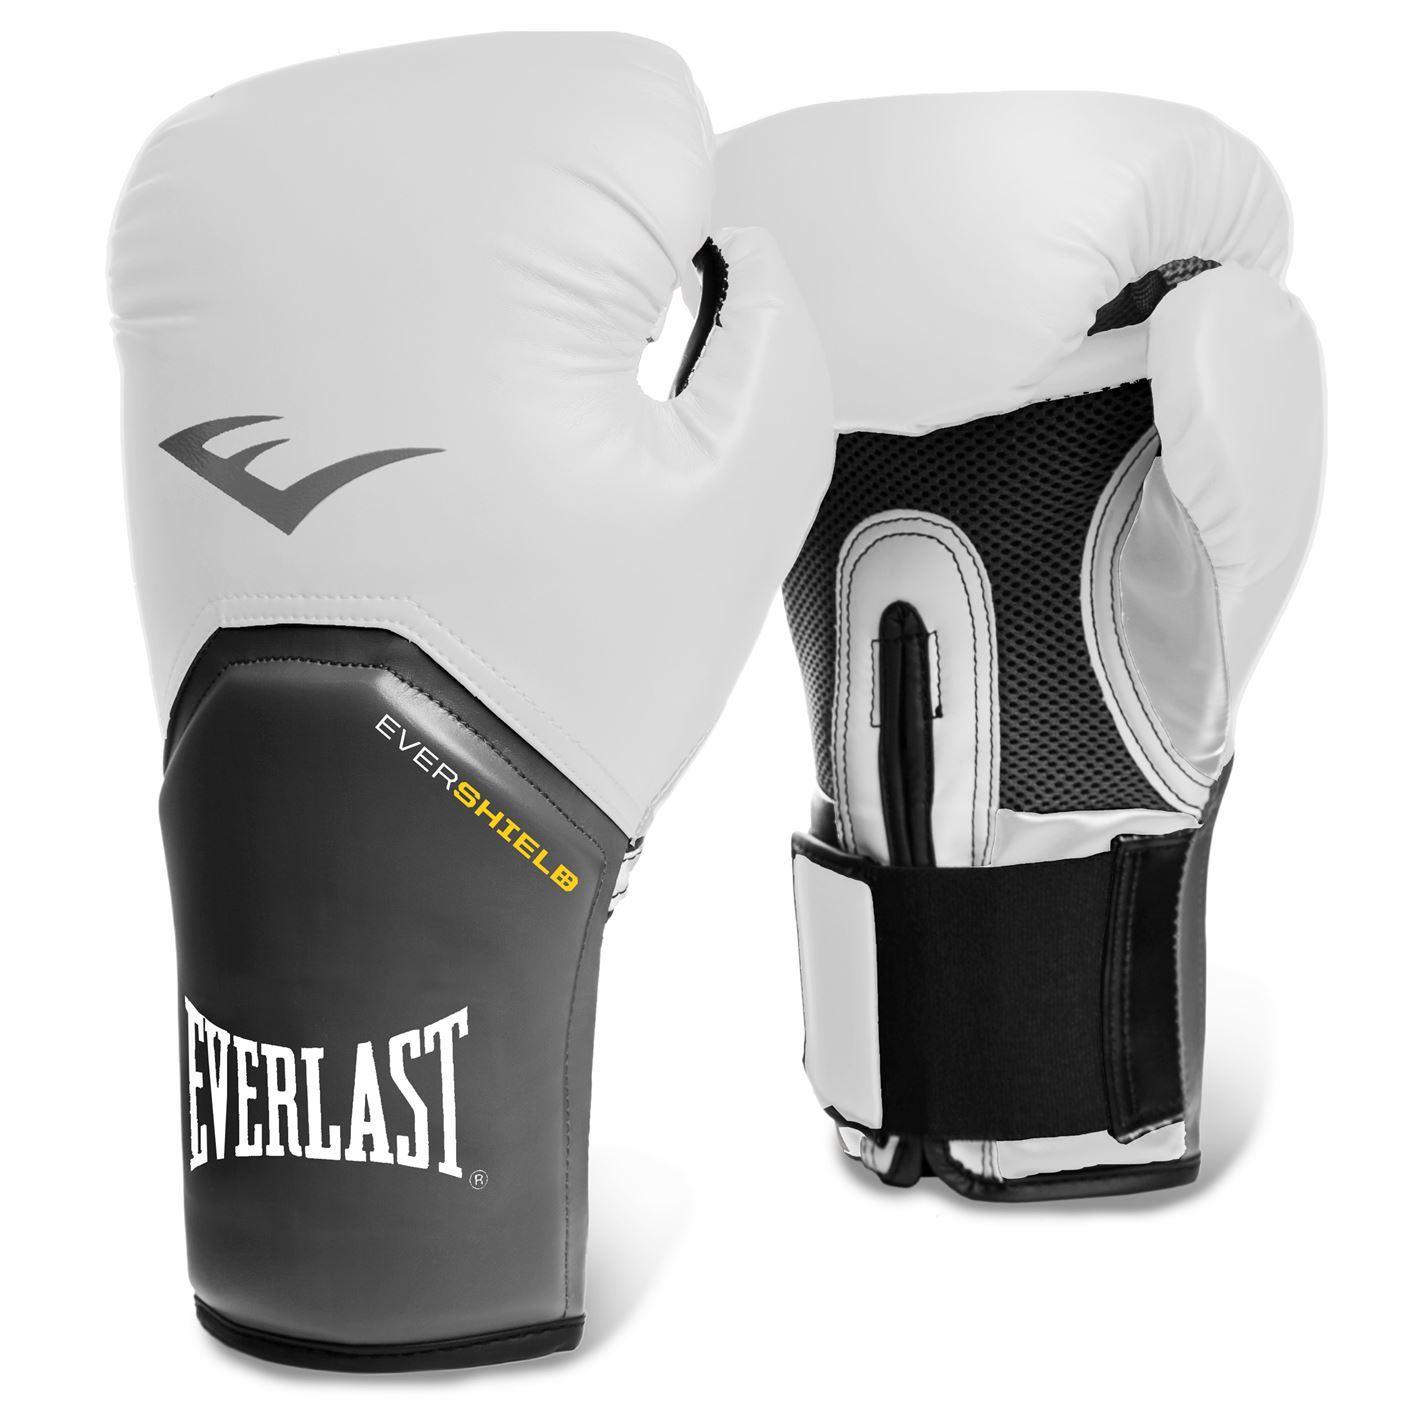 Shiv Naresh Teens Boxing Gloves 12oz: Everlast Elite Training Evershield Boxing Gloves Gym